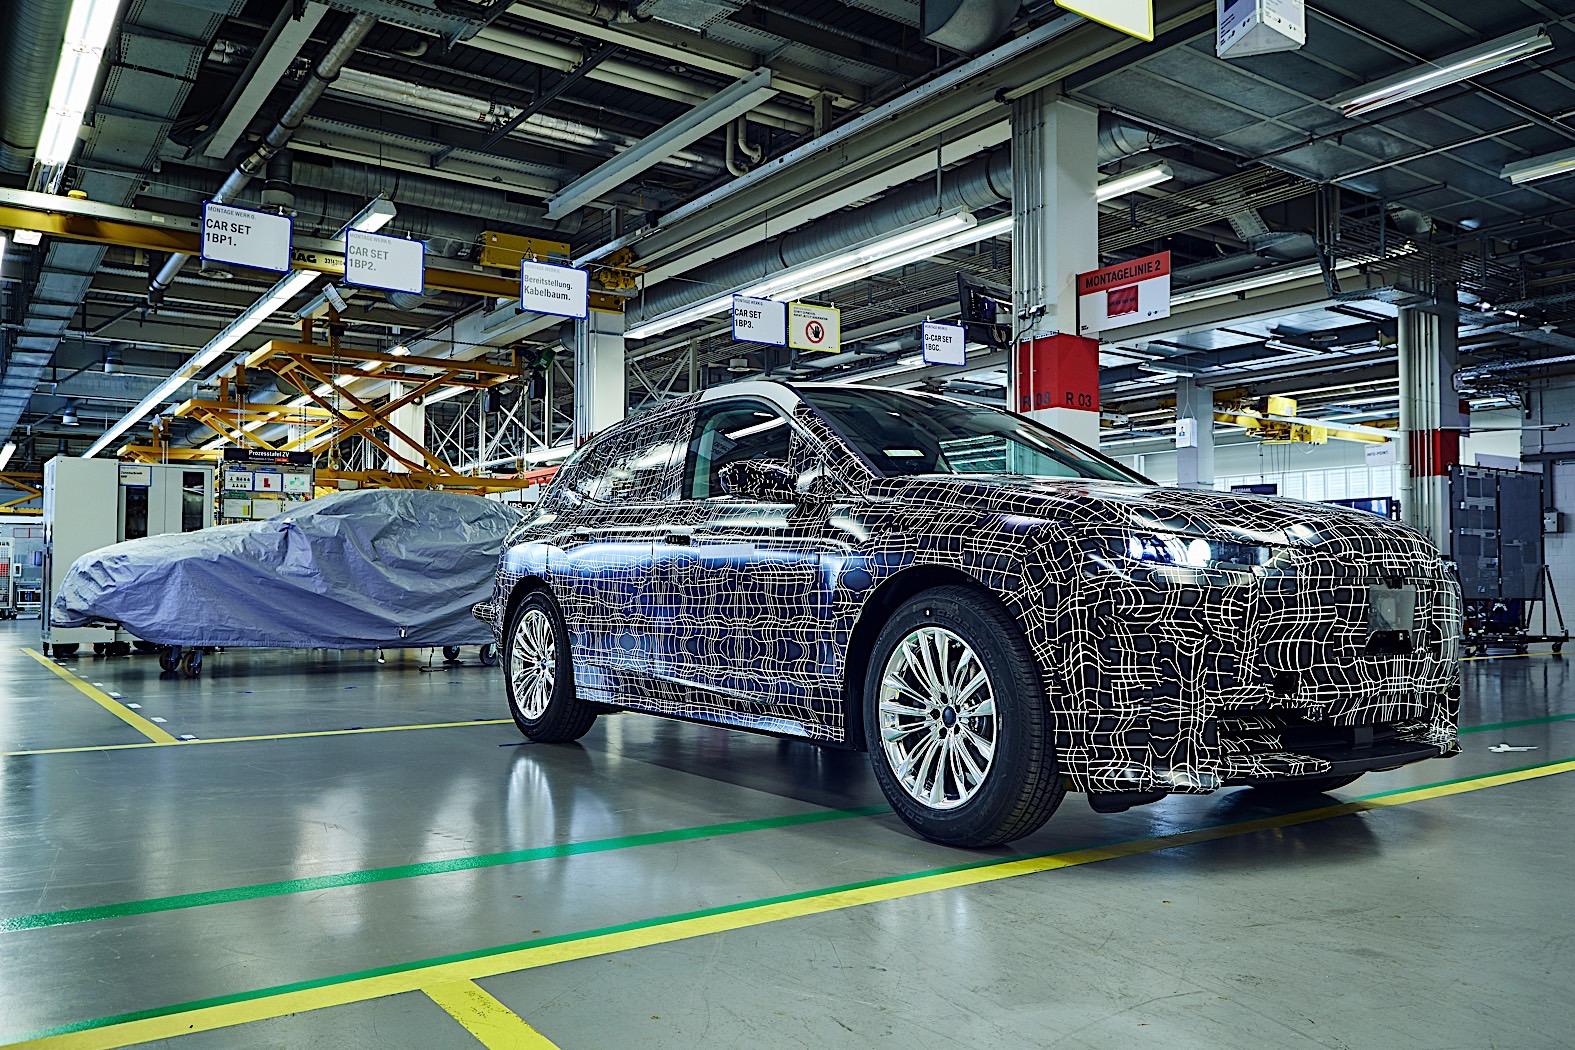 Sklapanje BMW iNext prototipova (VIDEO)